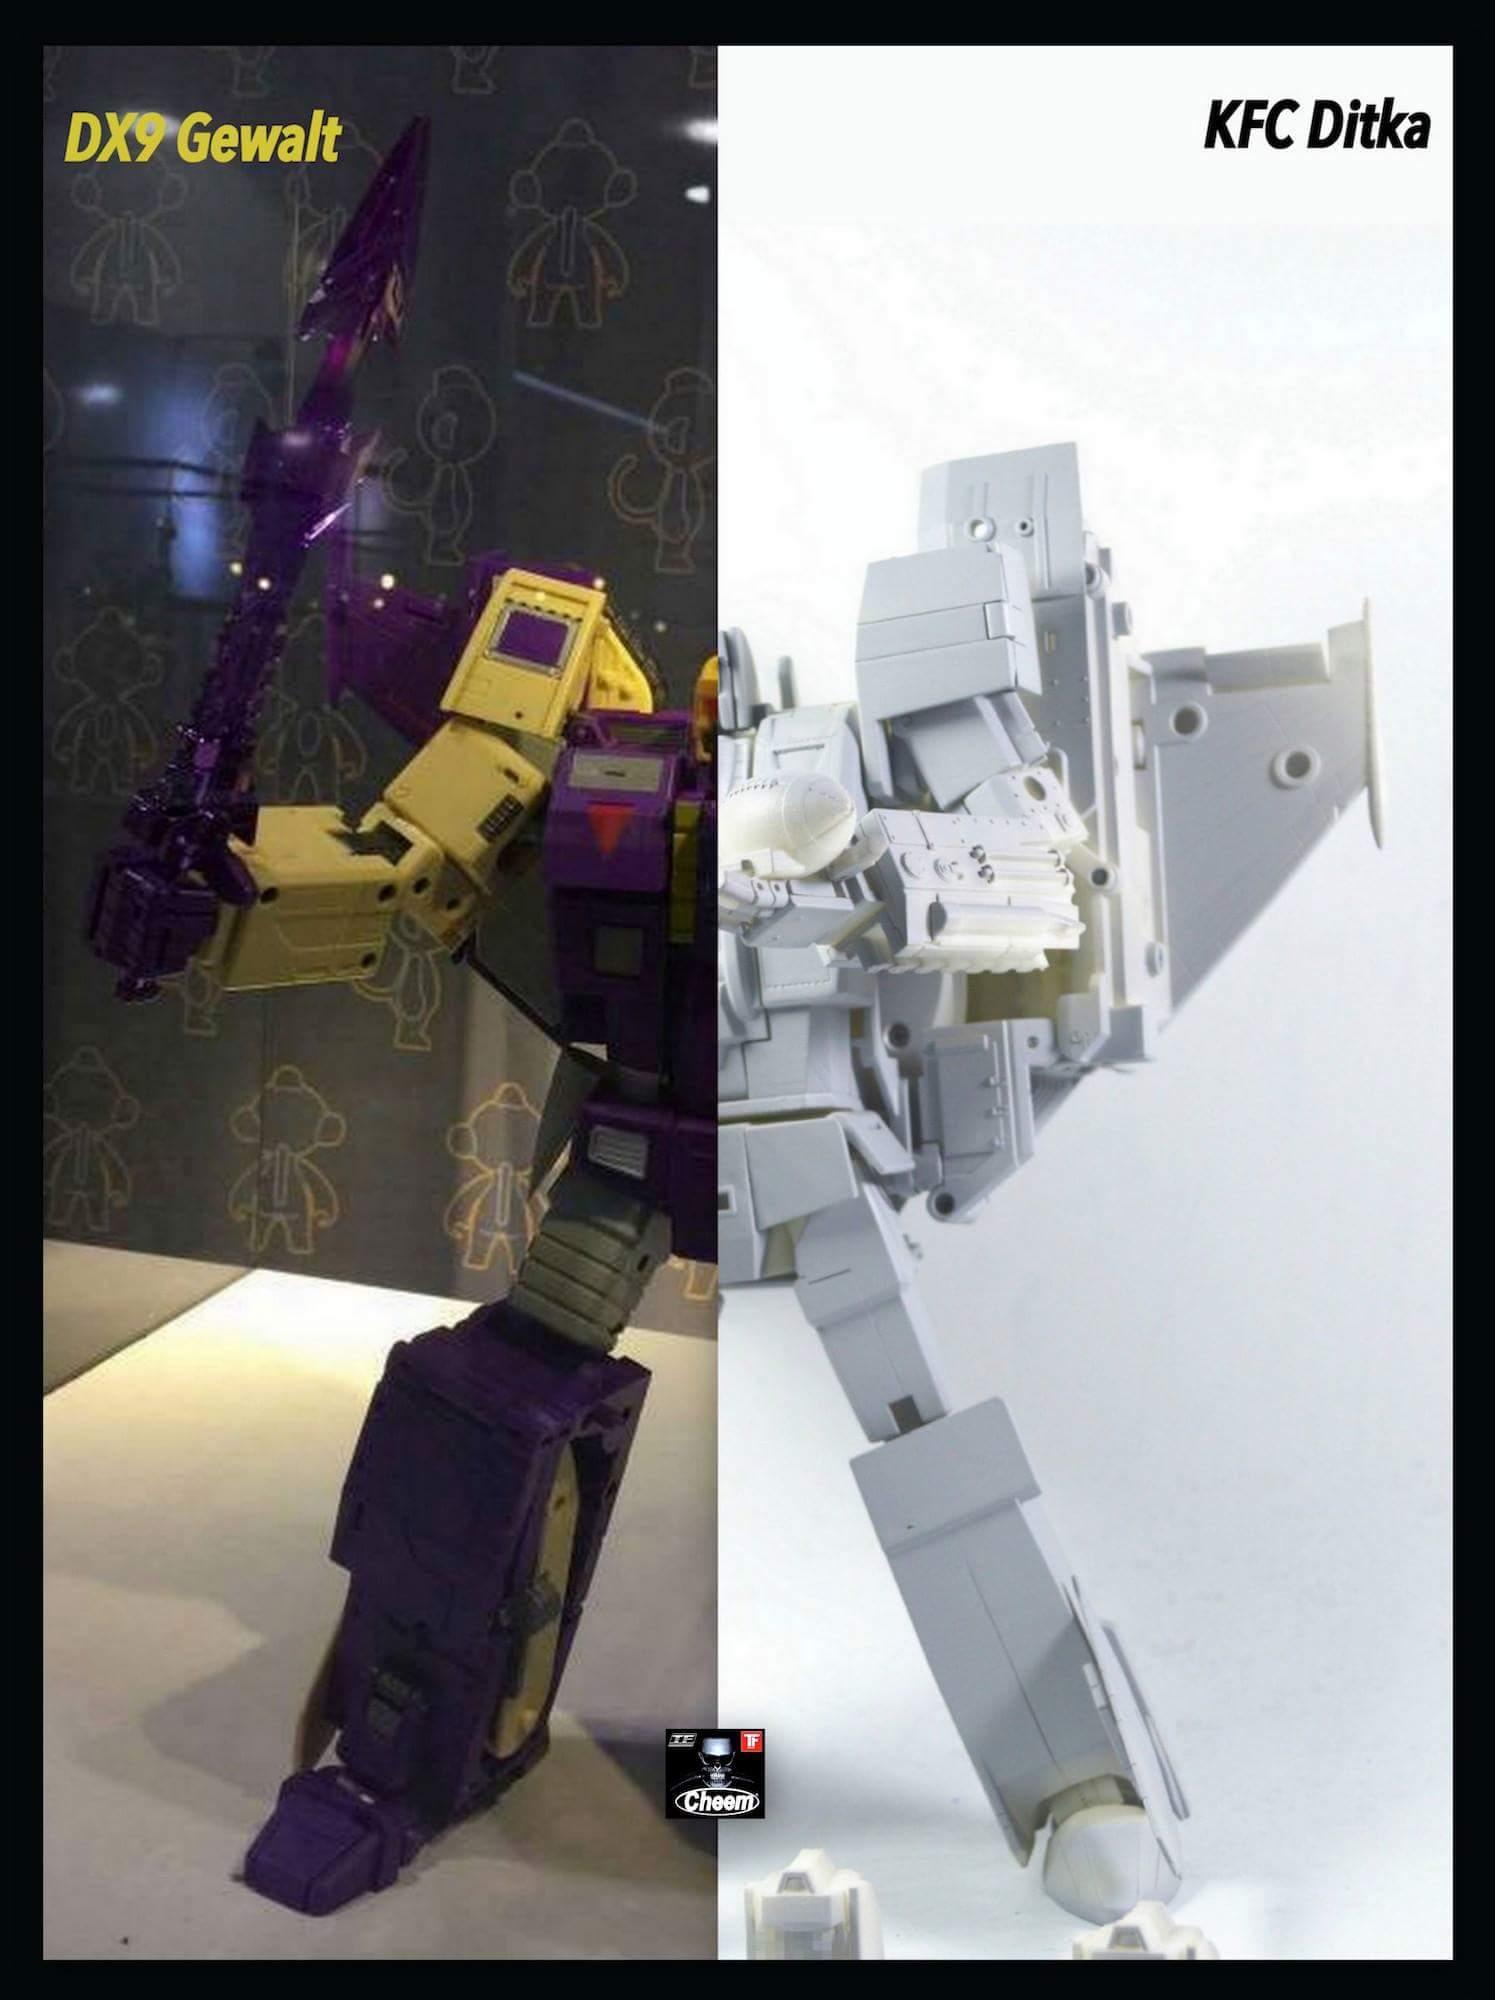 [KFC Toys] Produit Tiers - Jouet Phase 7-A Ditka - aka Blitzwing/Le Blitz QtC0a07b